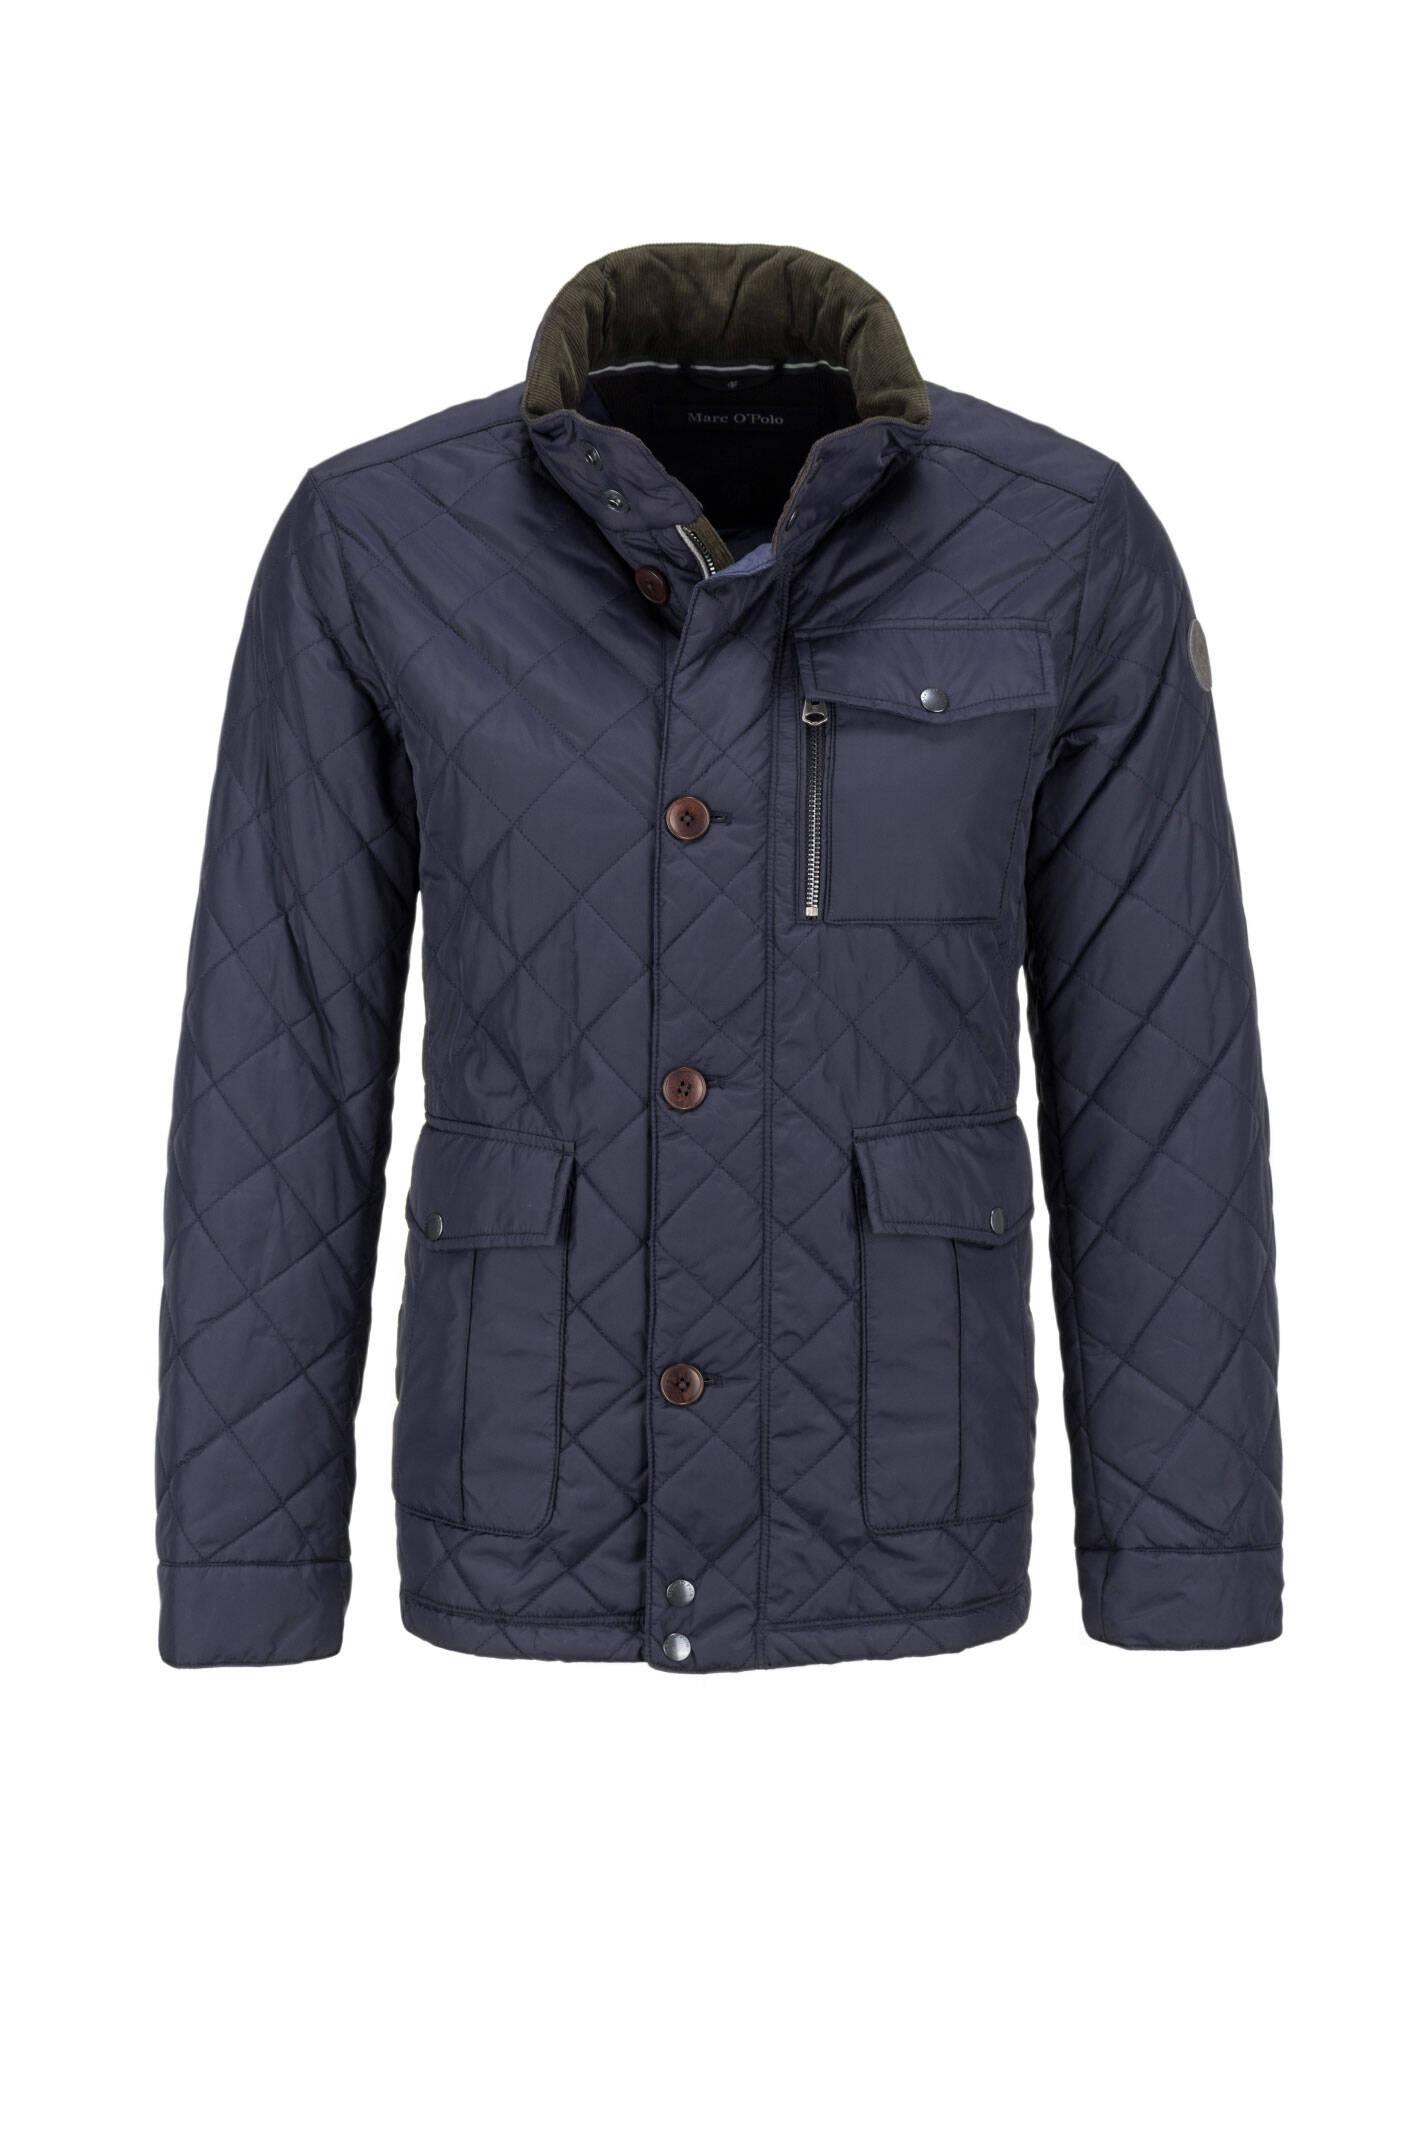 jacket marc o 39 polo navy blue coats and jackets. Black Bedroom Furniture Sets. Home Design Ideas